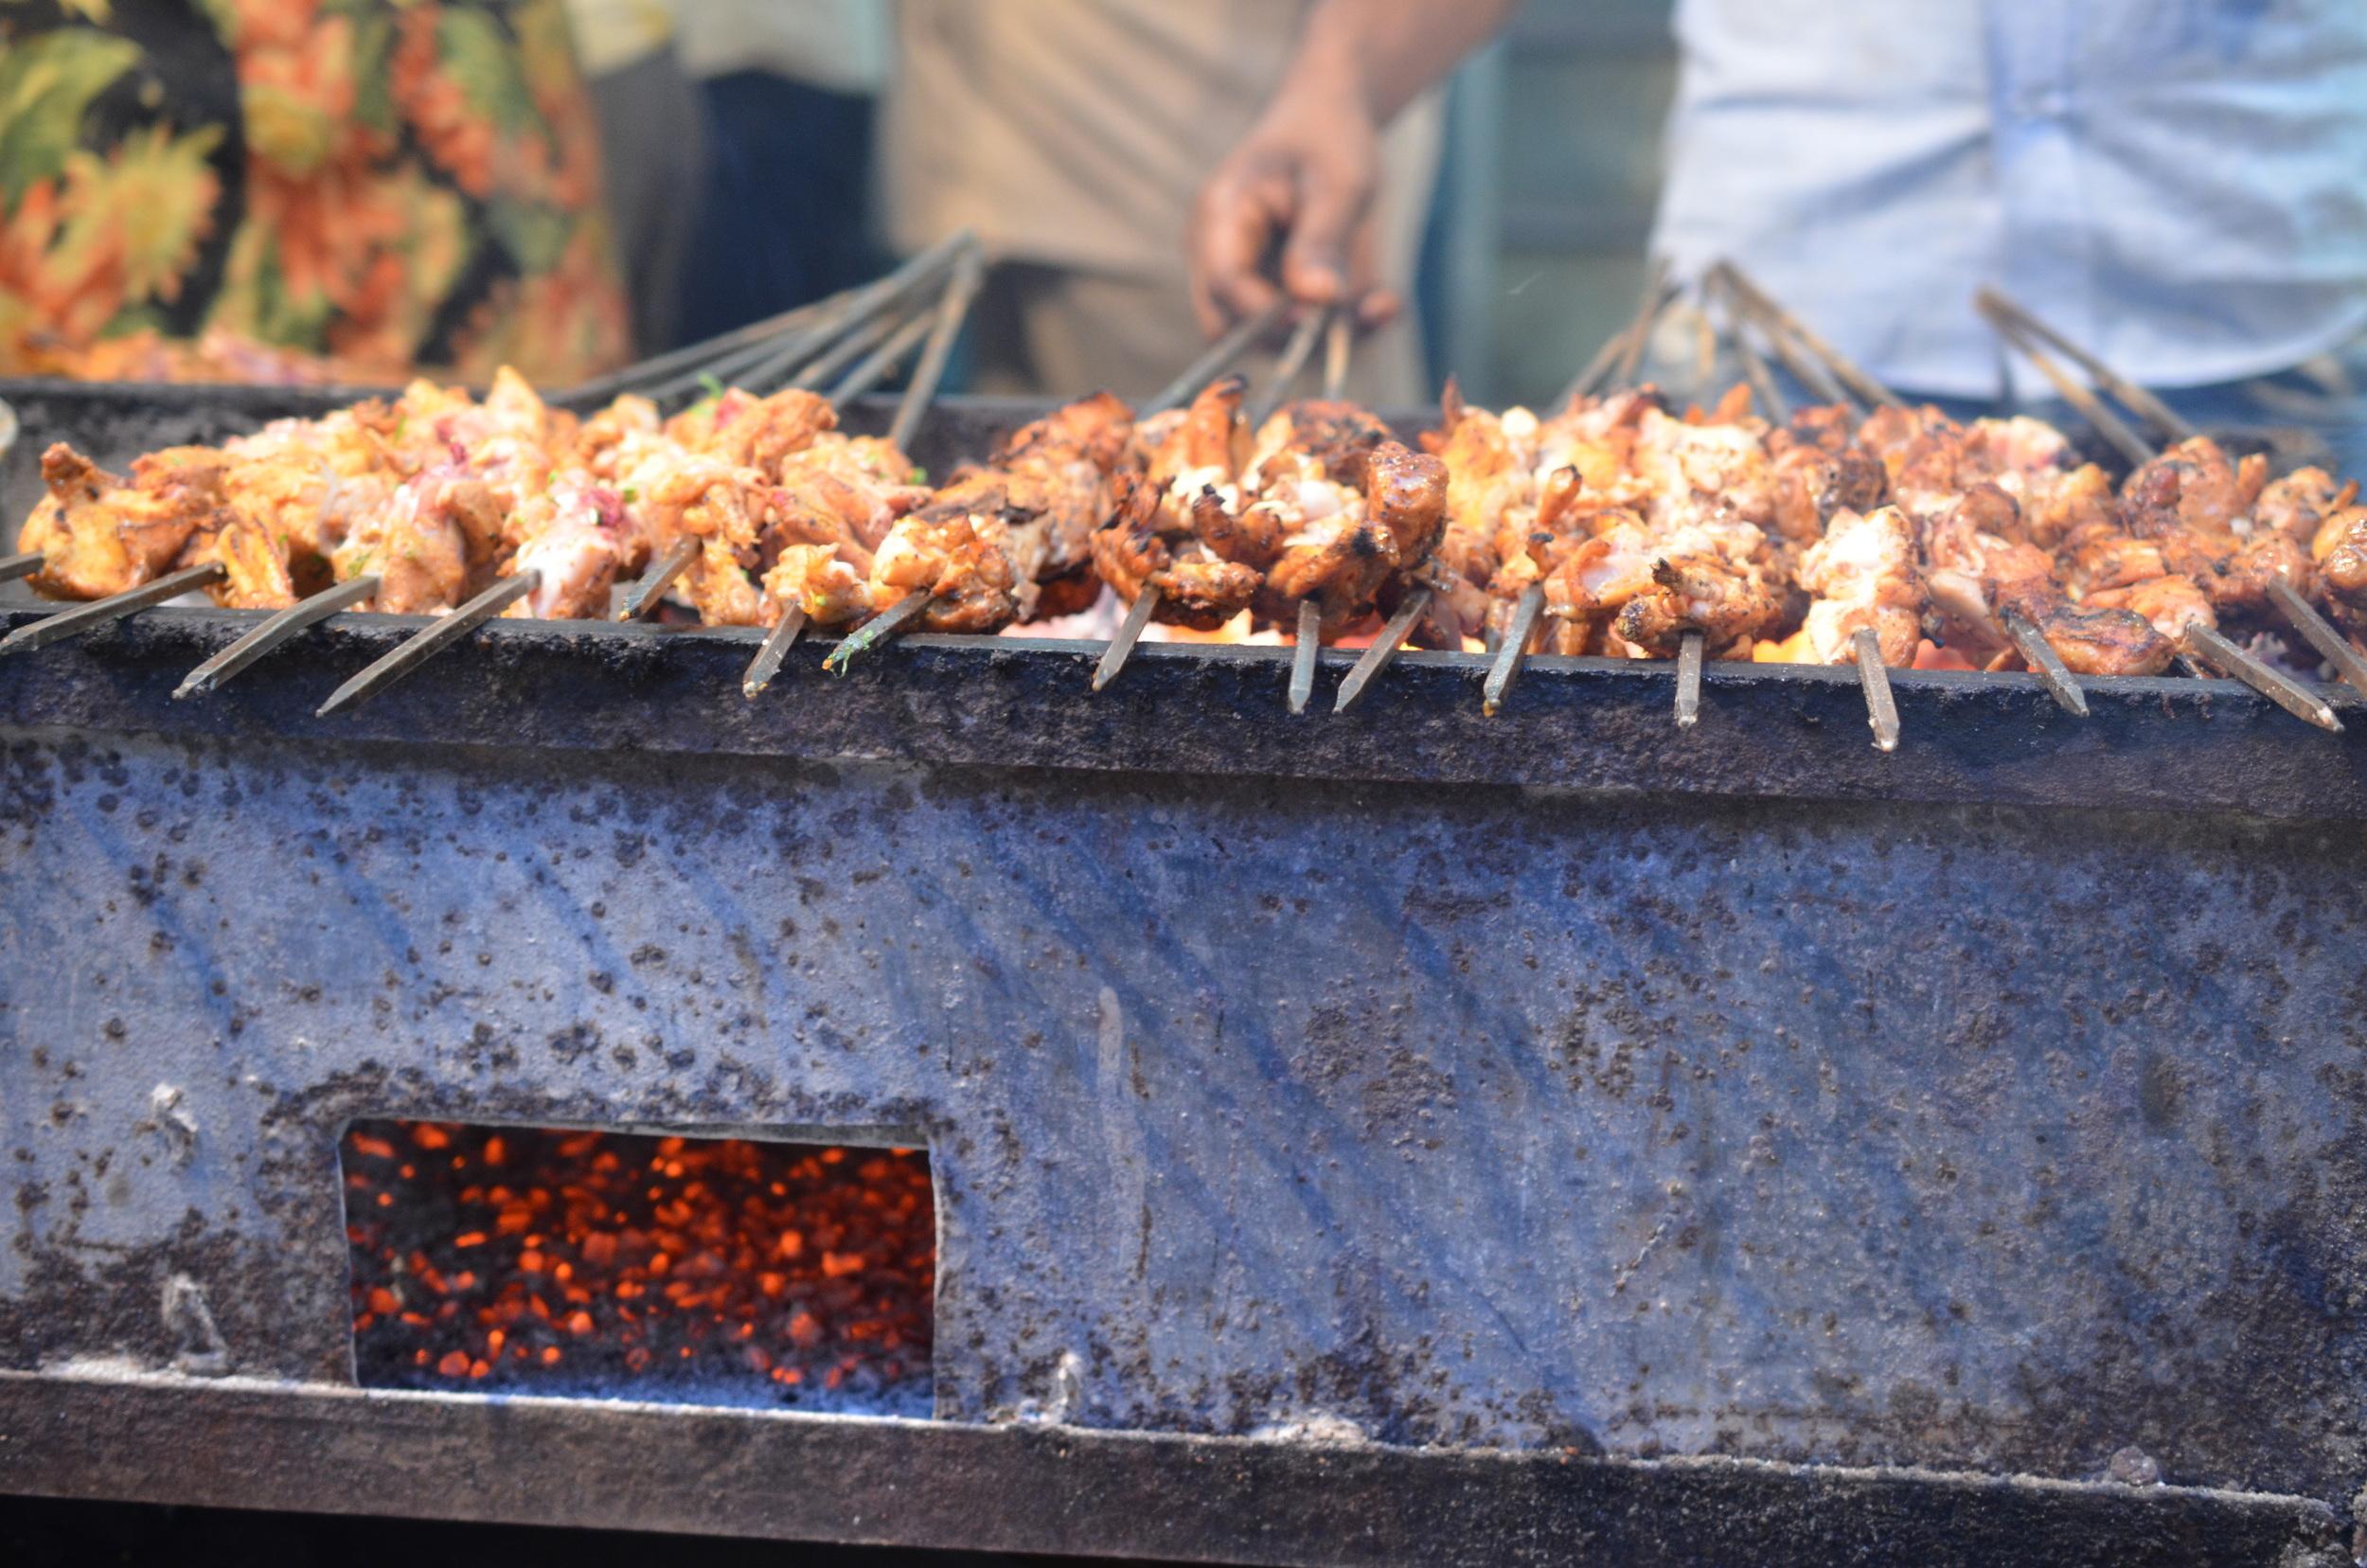 Chicken kebabs (Old Delhi, India)